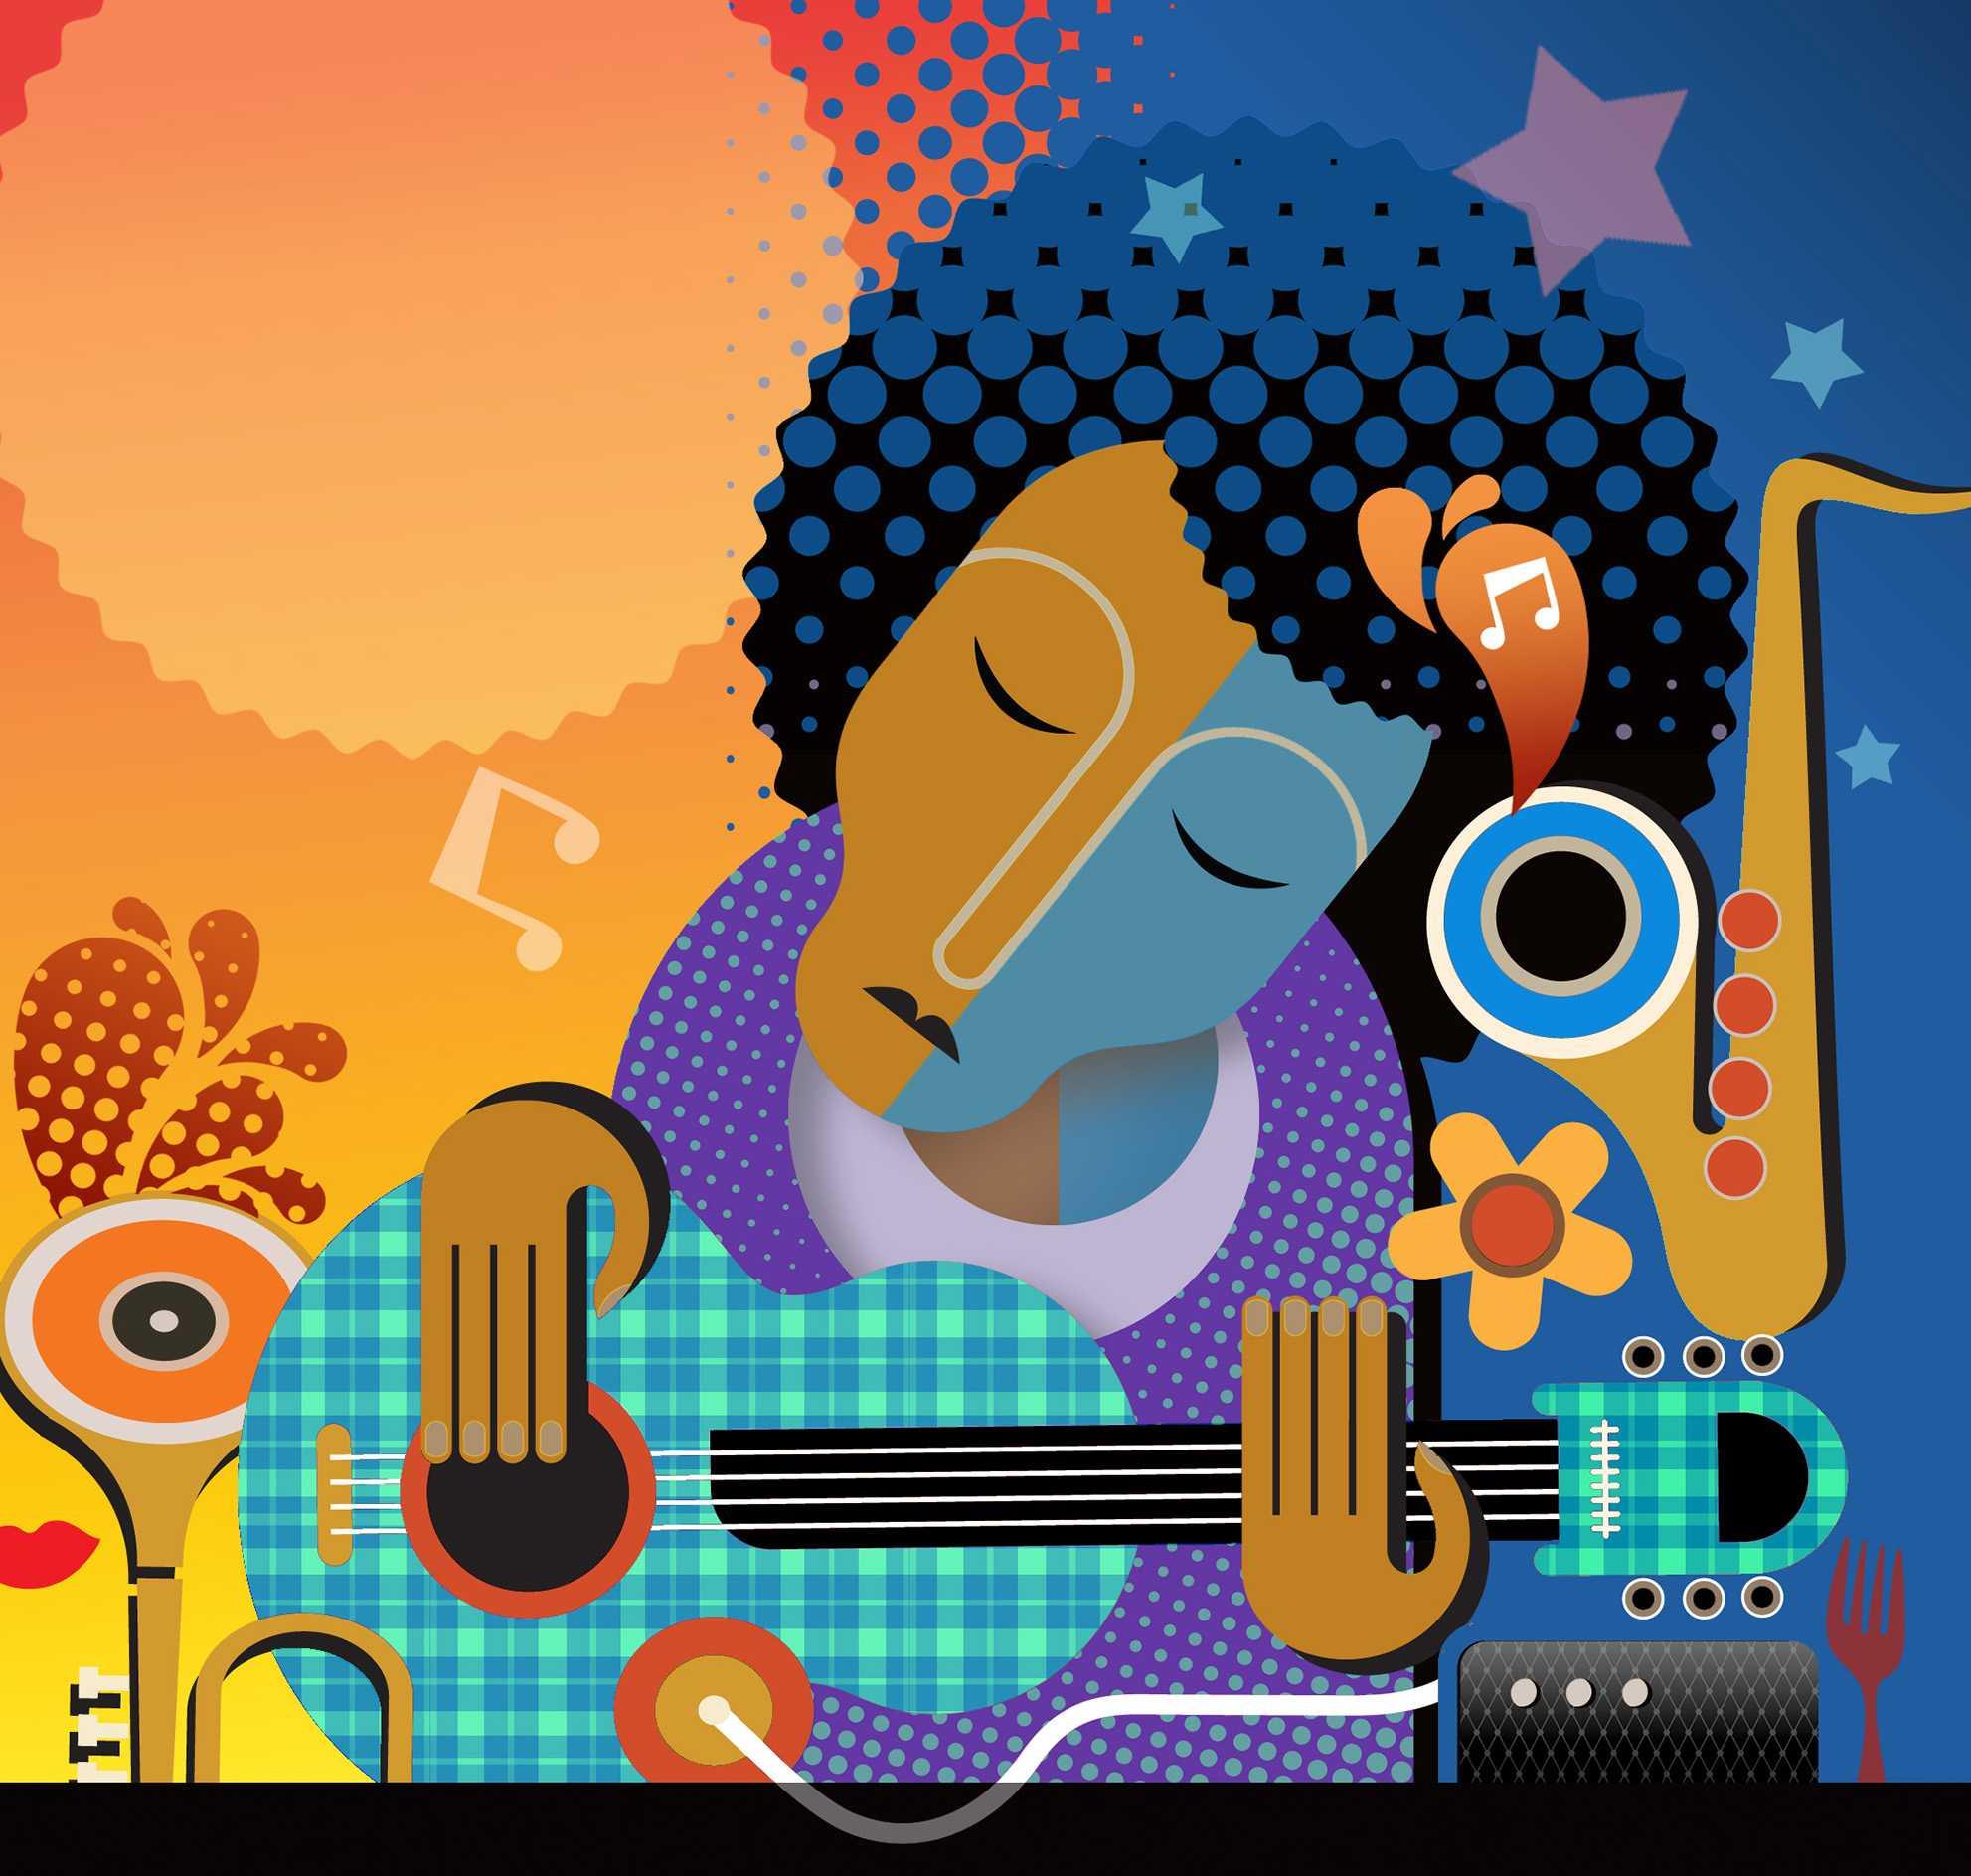 300 dpi Rick Nease illustration of jazz musician. (The Detroit Free Press/MCT)